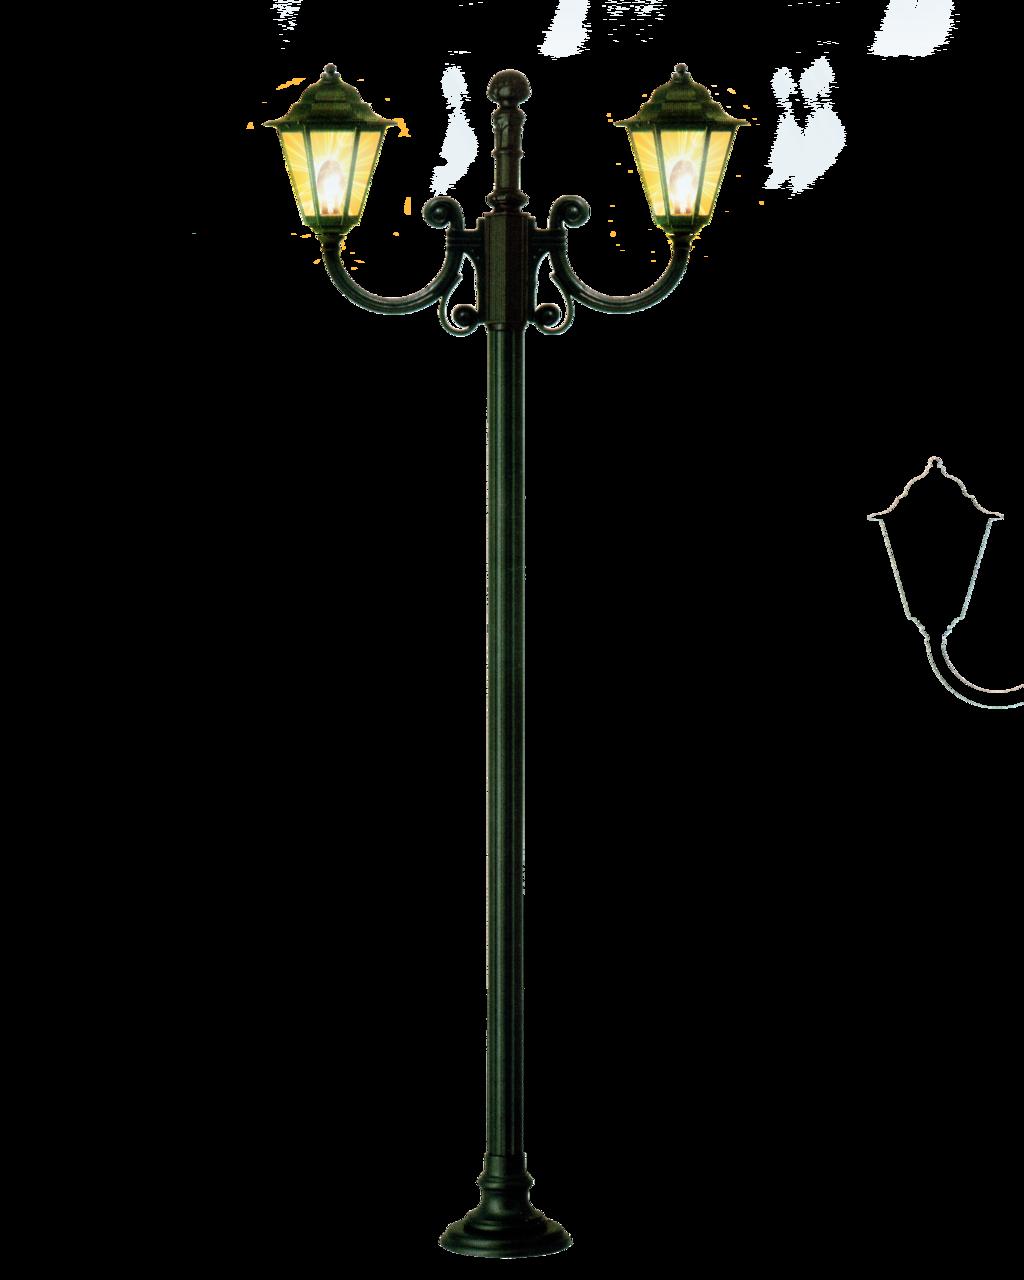 Download Cartoon Lamp Post Light HQ PNG Image.